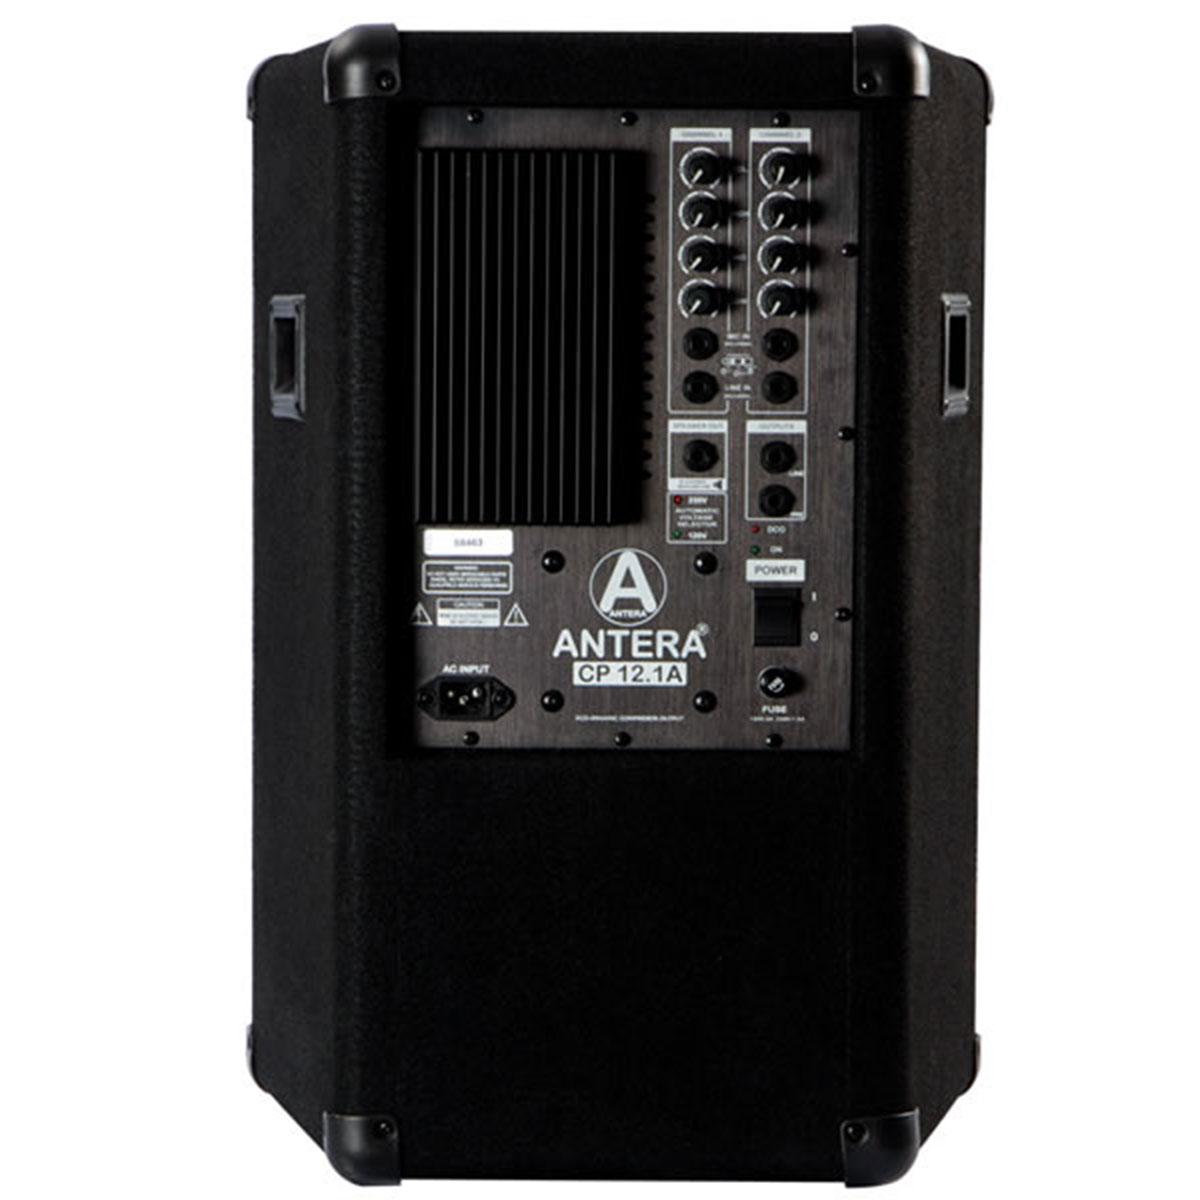 Caixa Ativa Fal 12 Pol 170W - CP 12.1A Antera